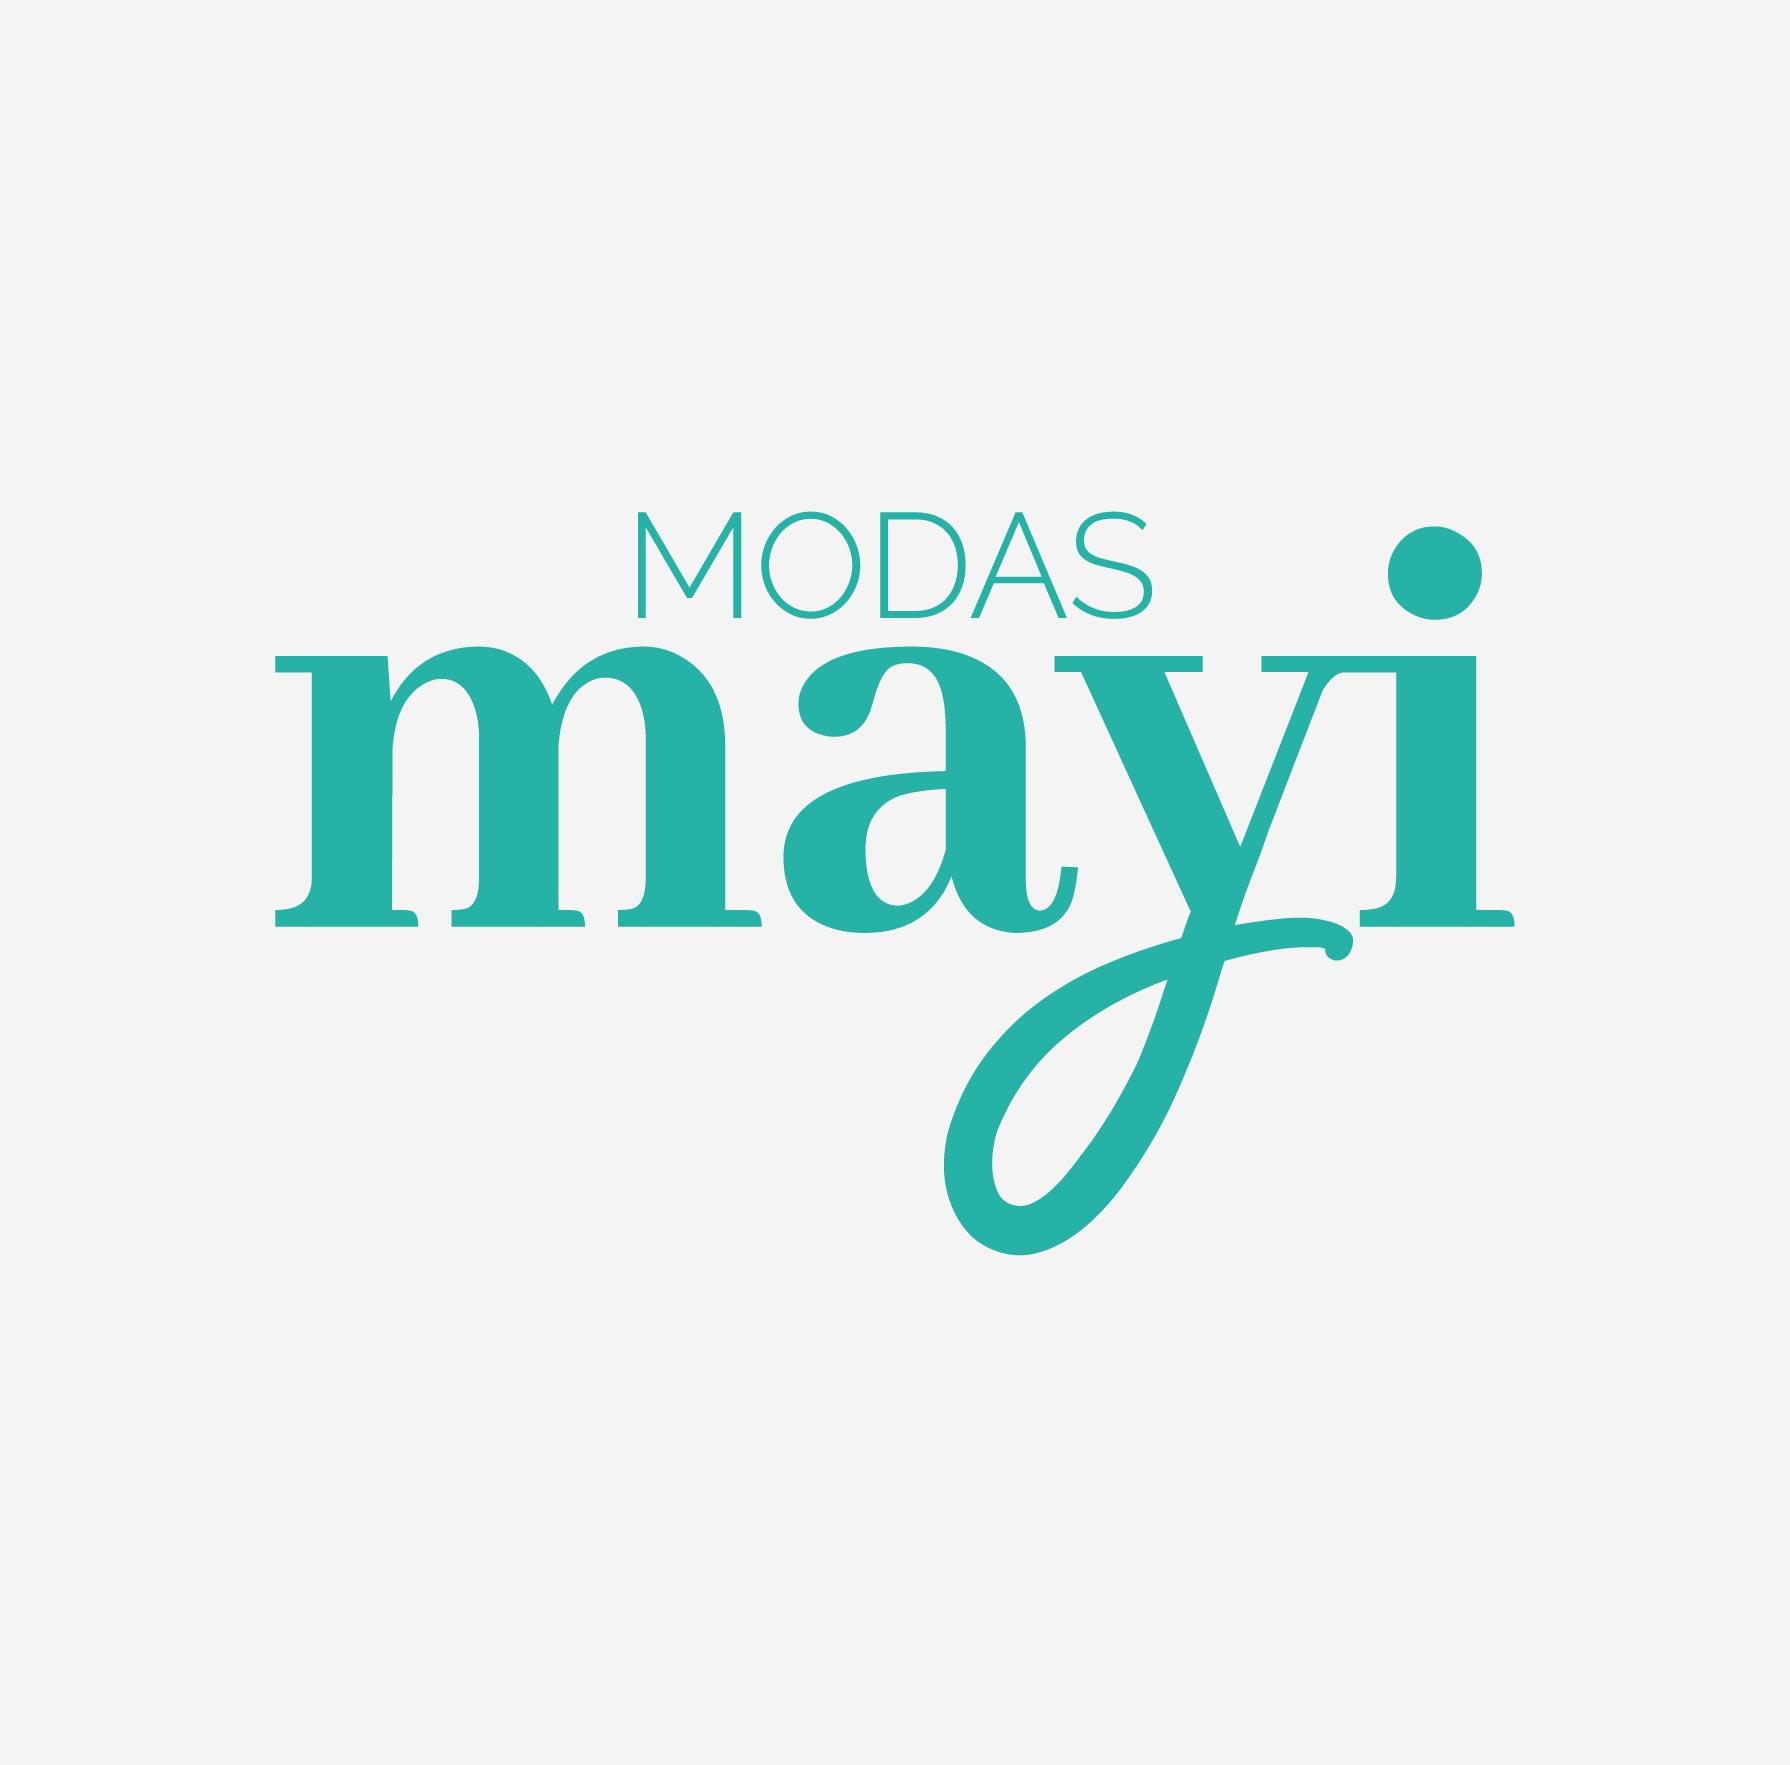 diseño-logo-tienda-moda-mayi